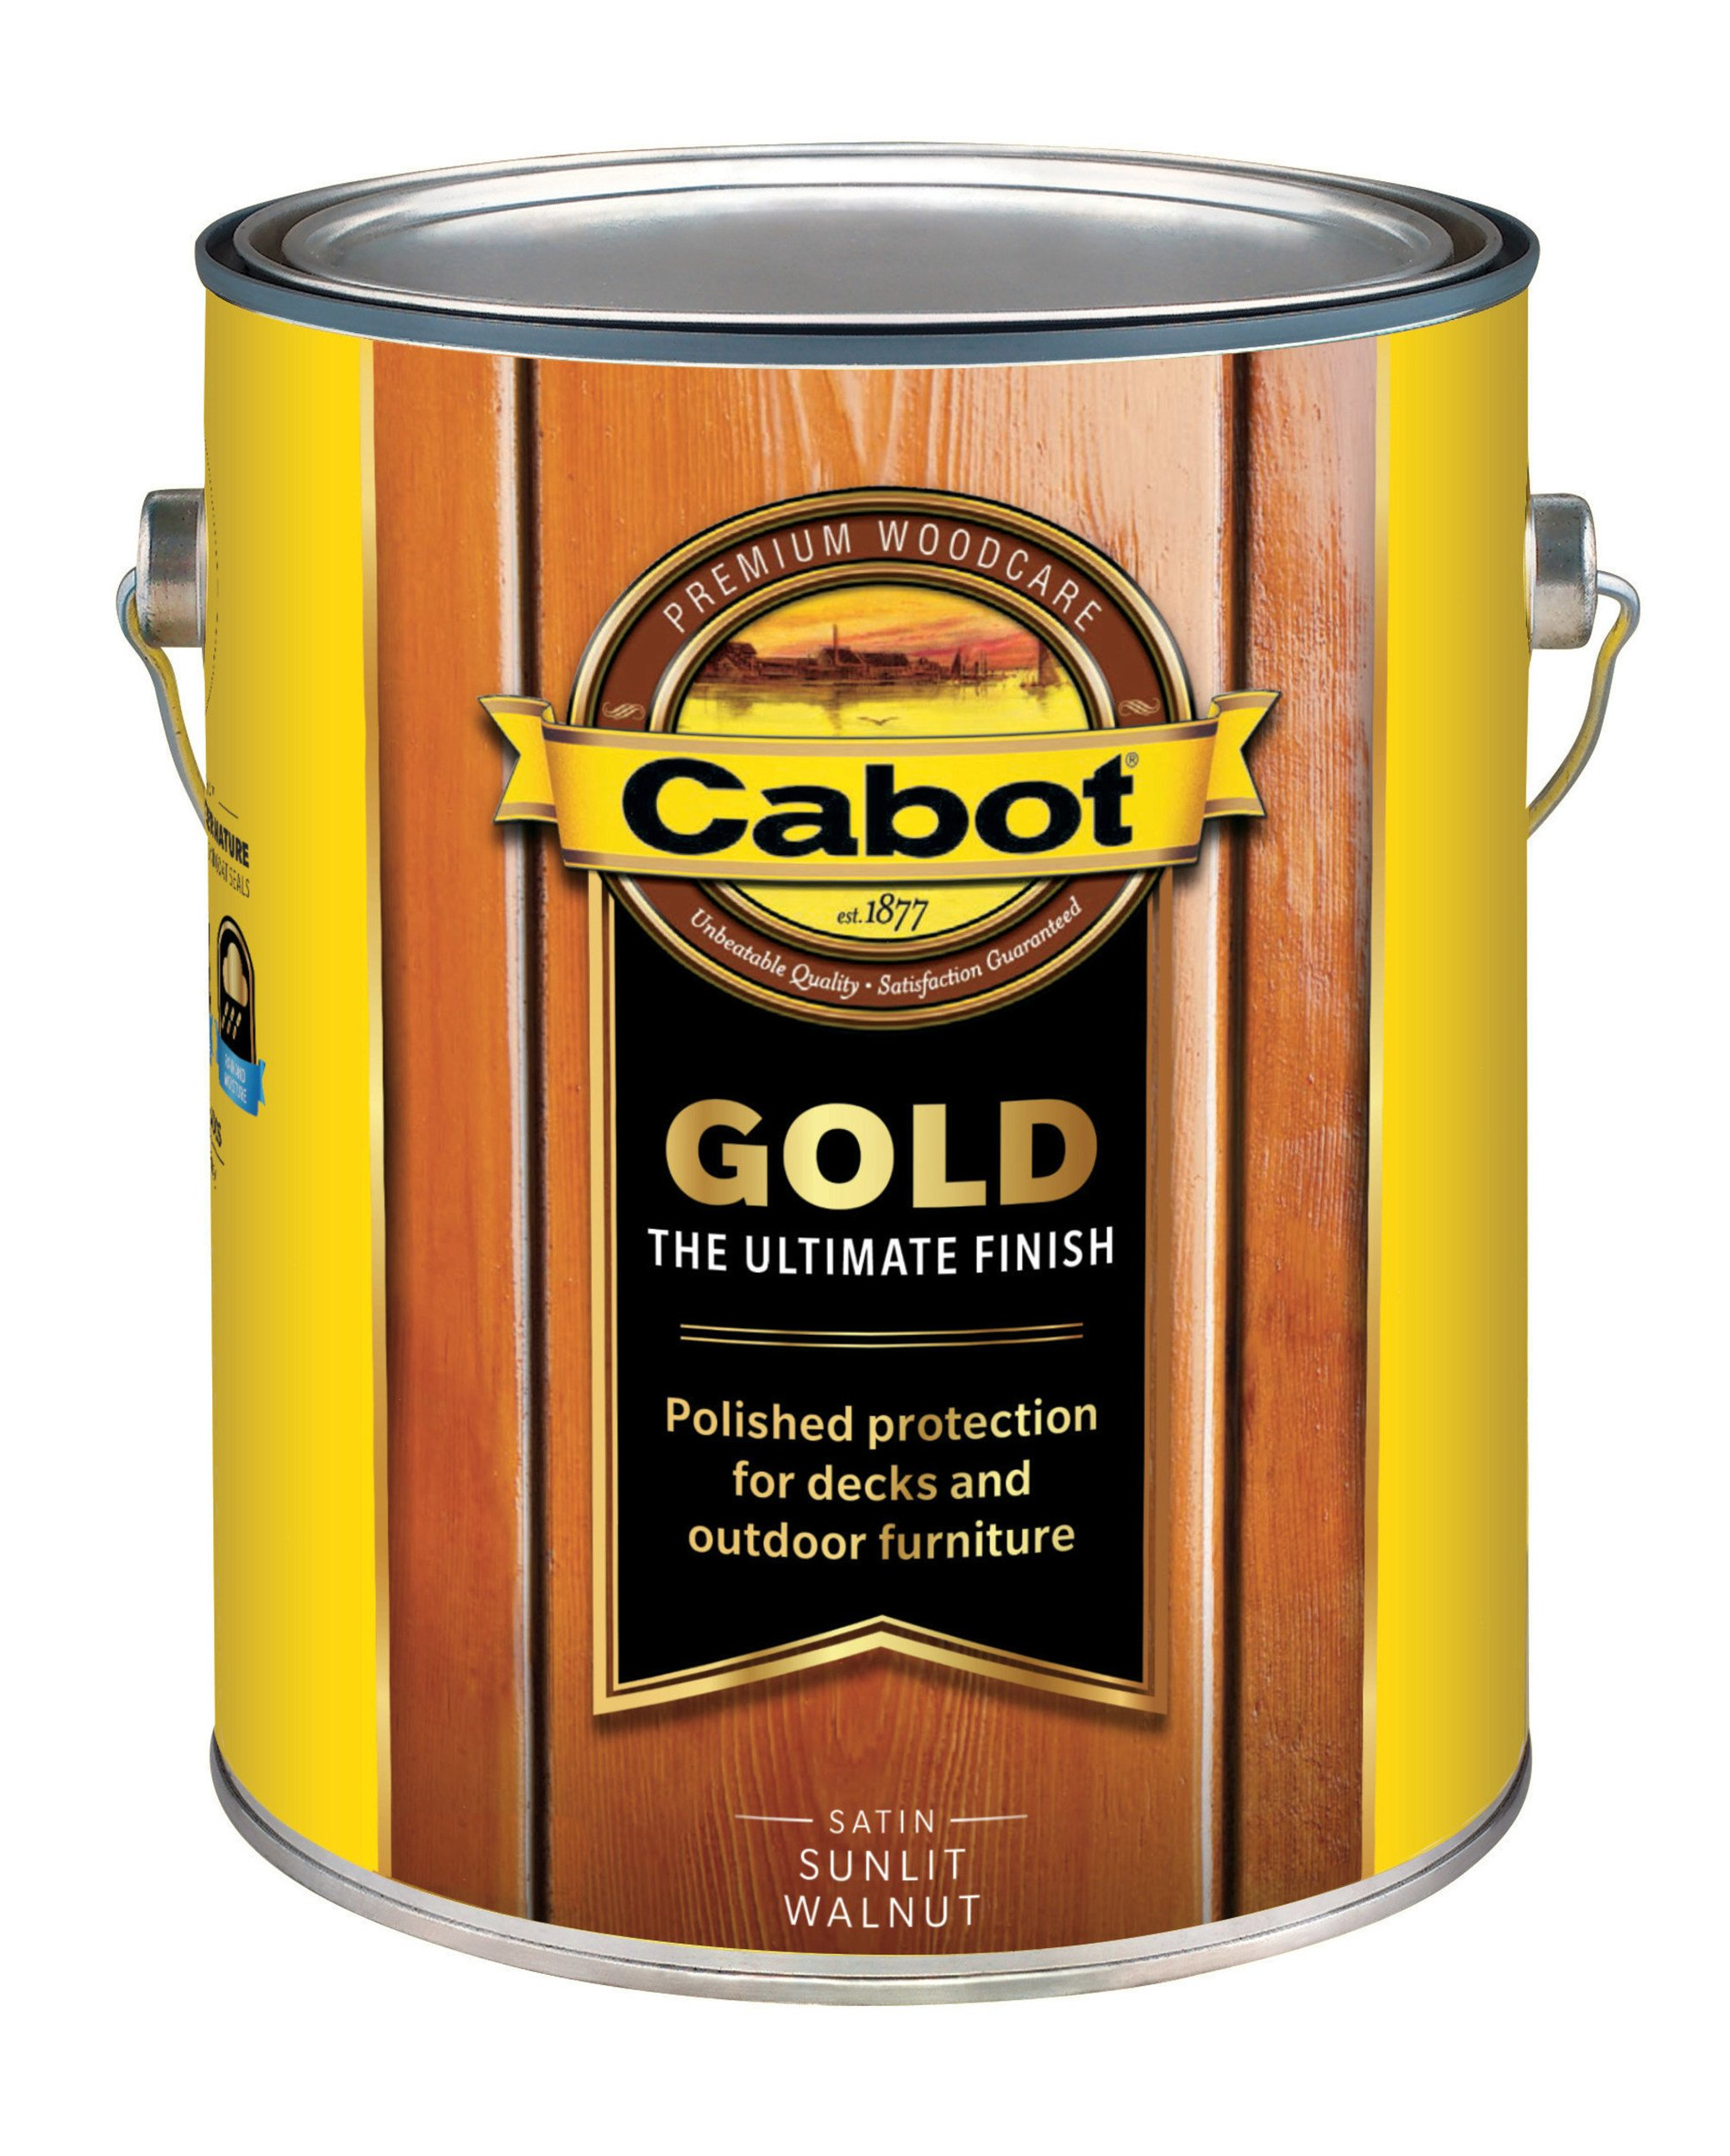 Cabot Gold thumbnail